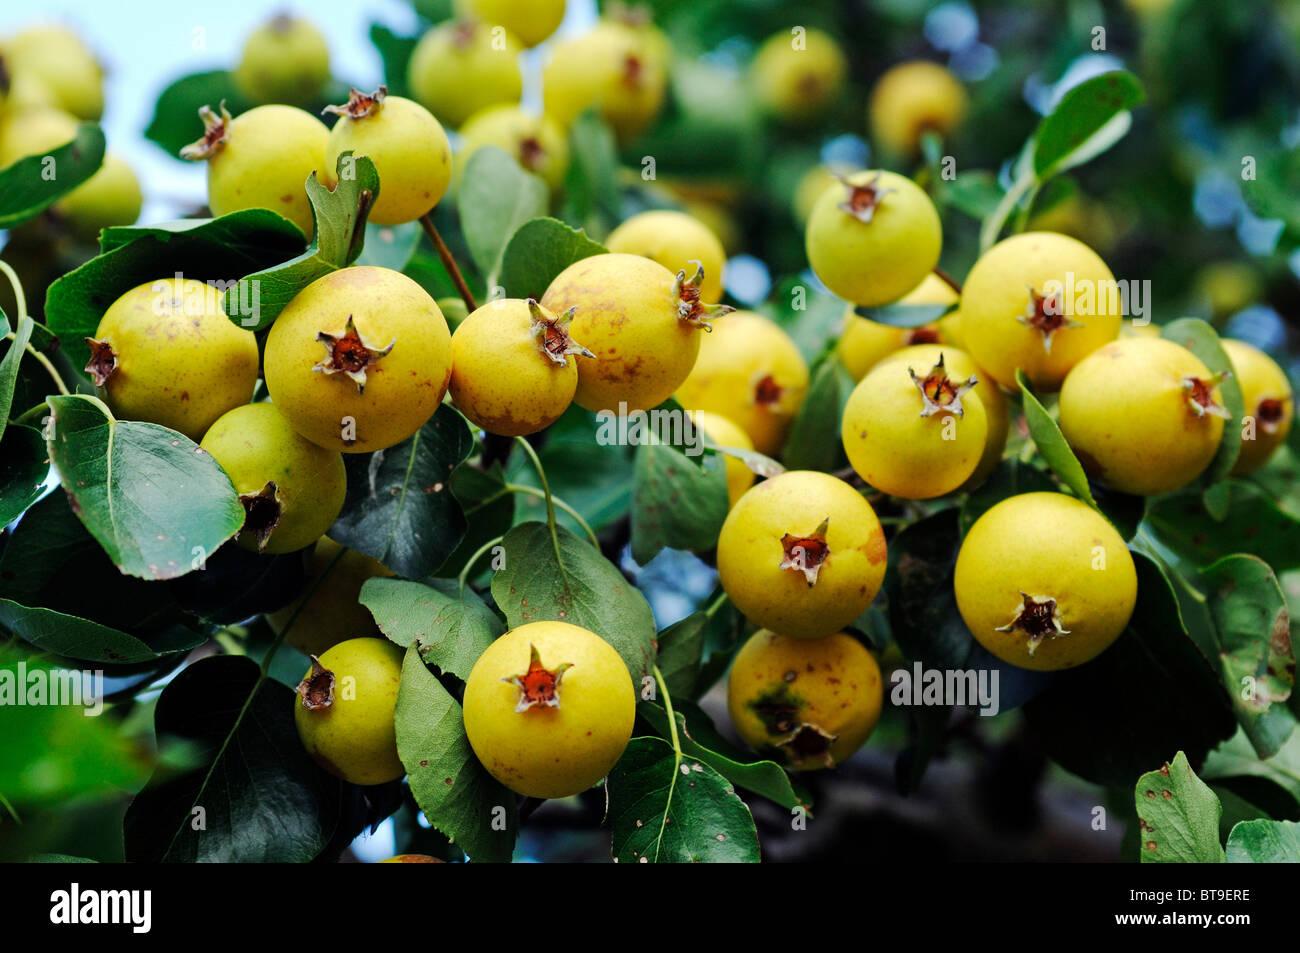 Wild Pear (Pyrus pyraster), pear, Biosphaerenreservat Suedost-Ruegen Biosphere Reserve South-East Ruegen, Ruegen - Stock Image